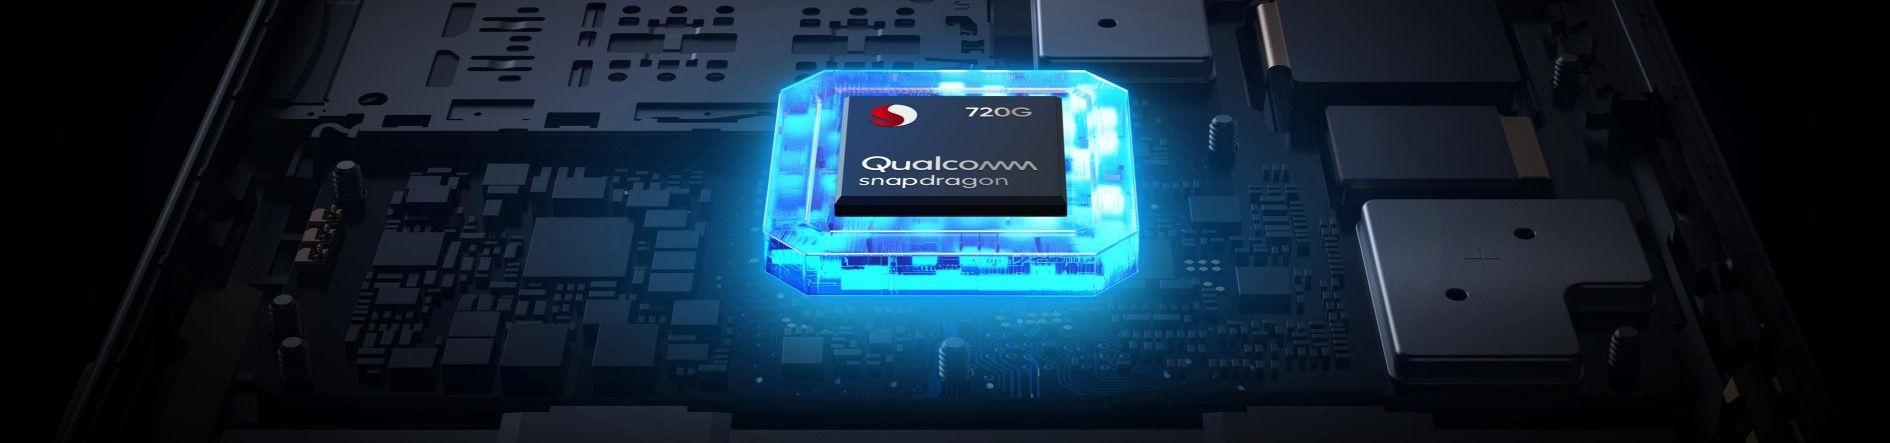 Realme 6 Pro процессор